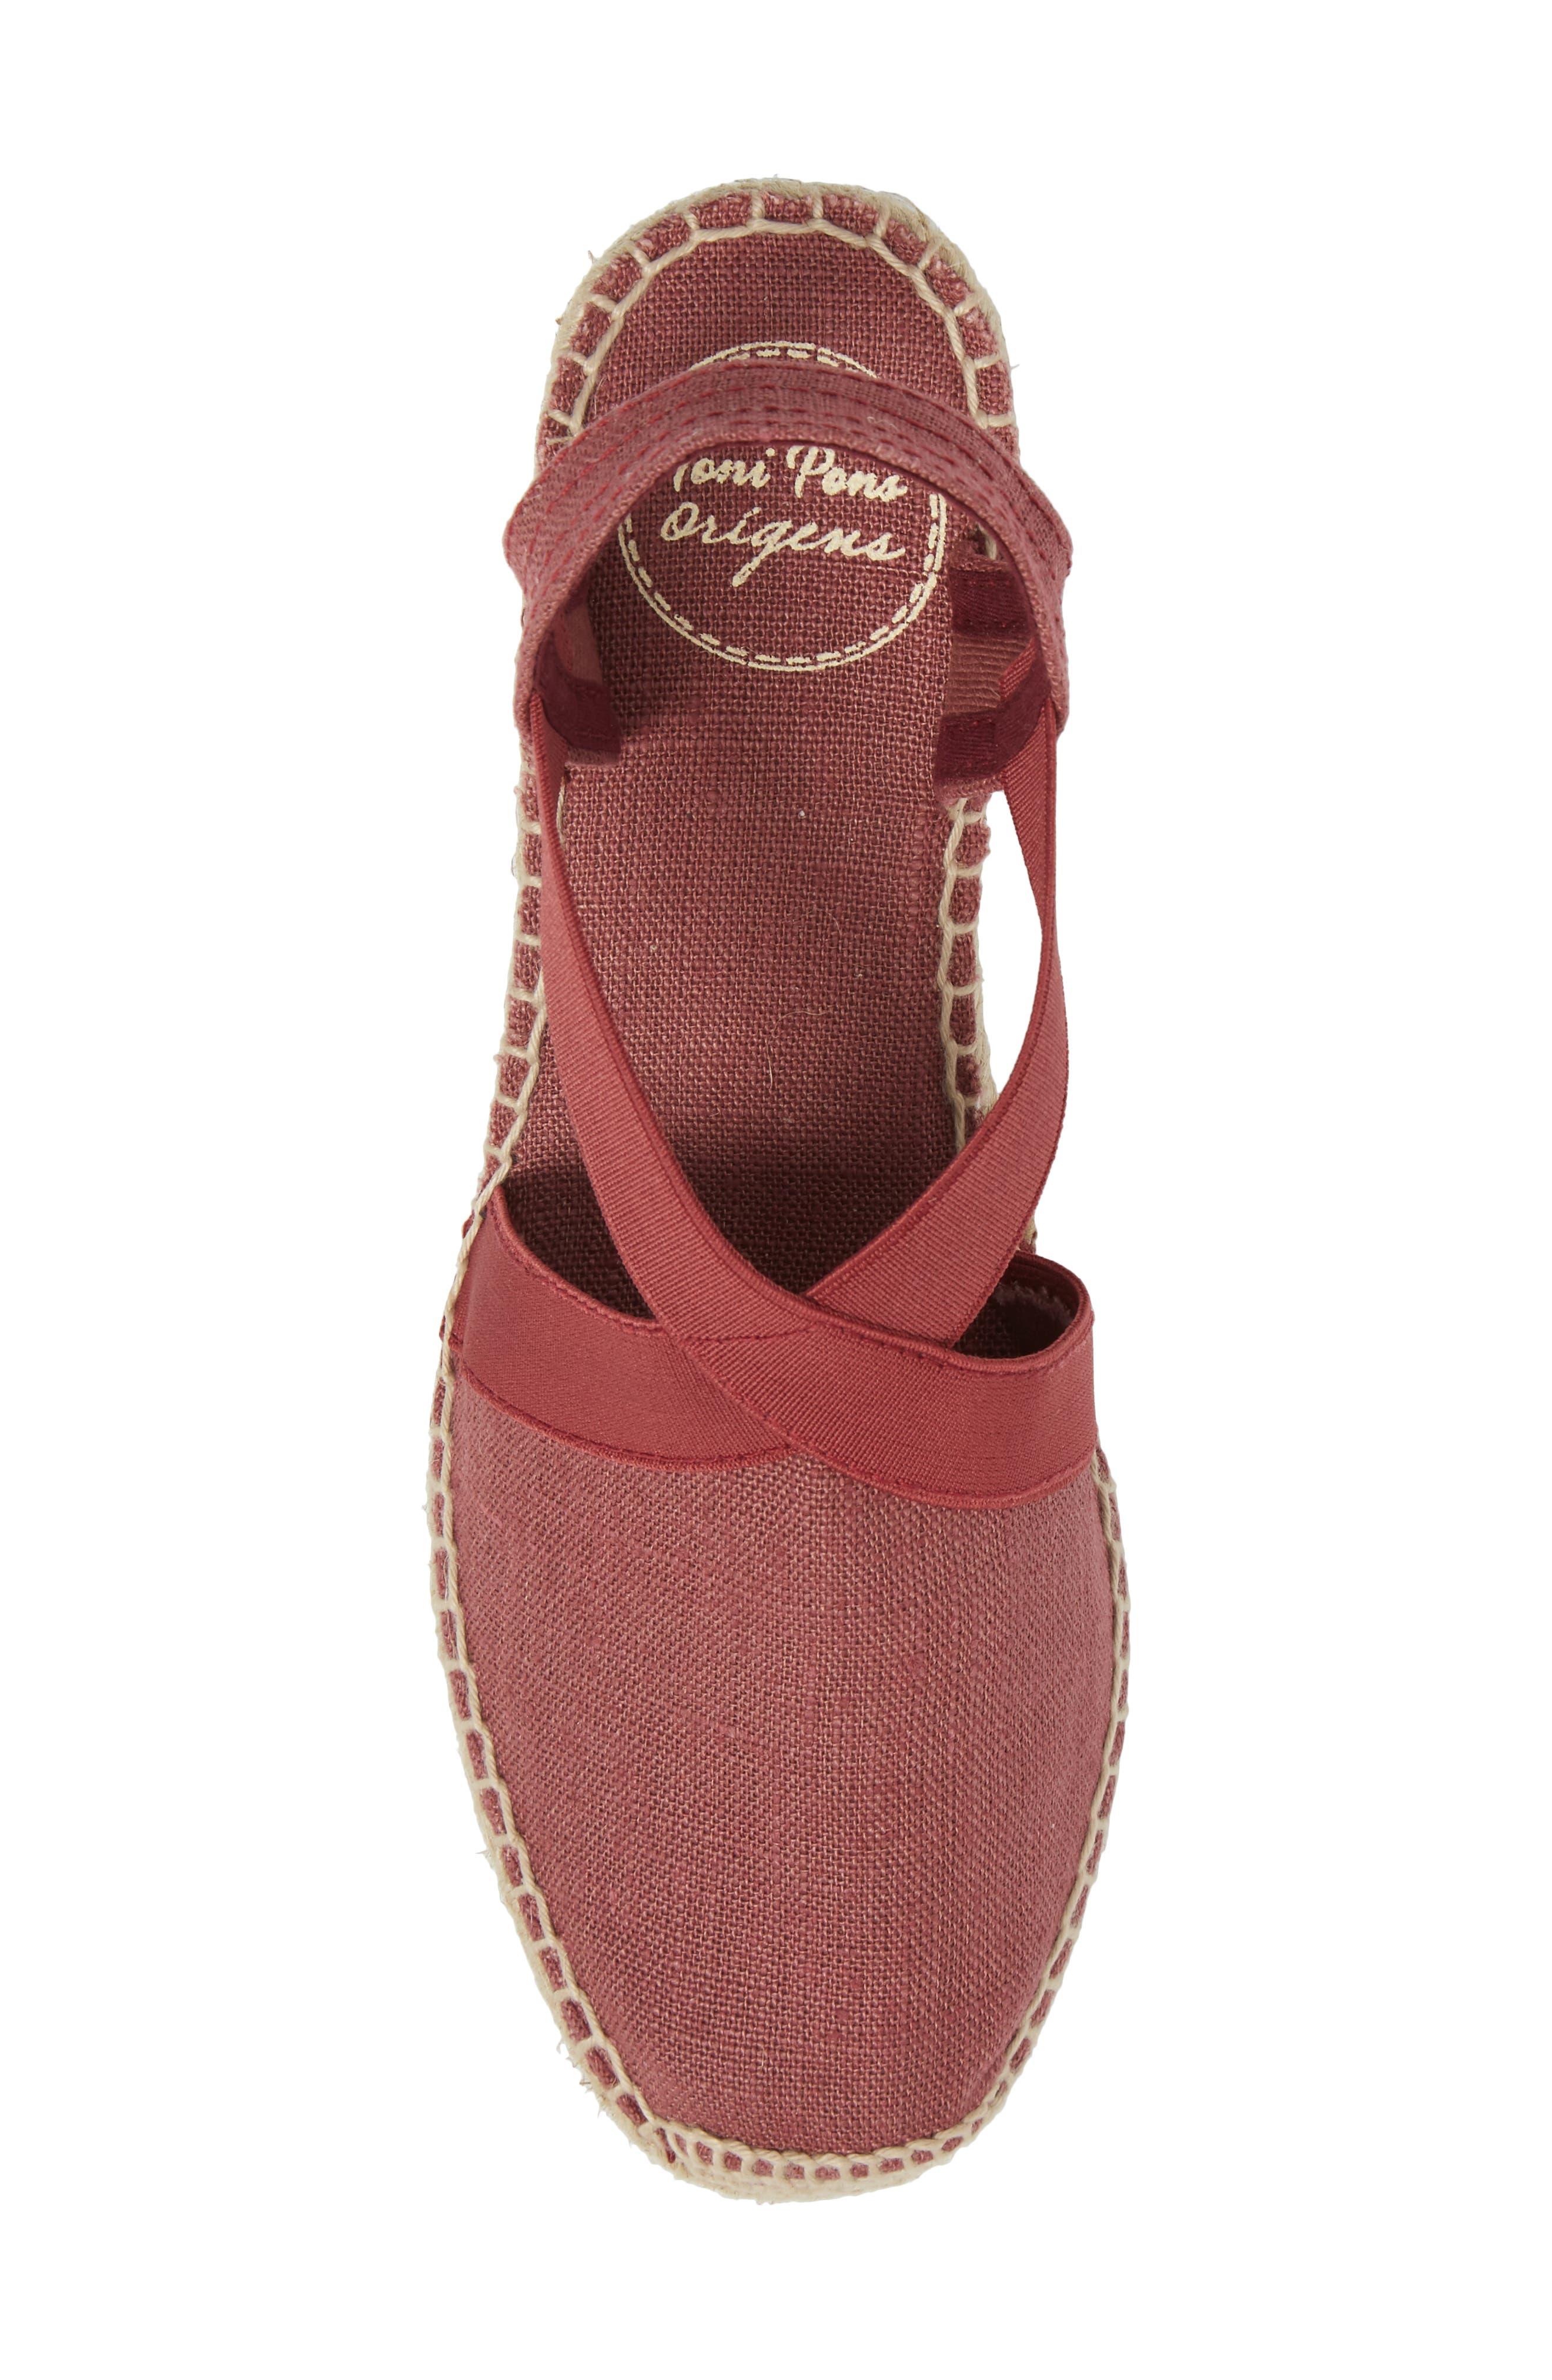 'Ter' Slingback Espadrille Sandal,                             Alternate thumbnail 5, color,                             Bru Fabric